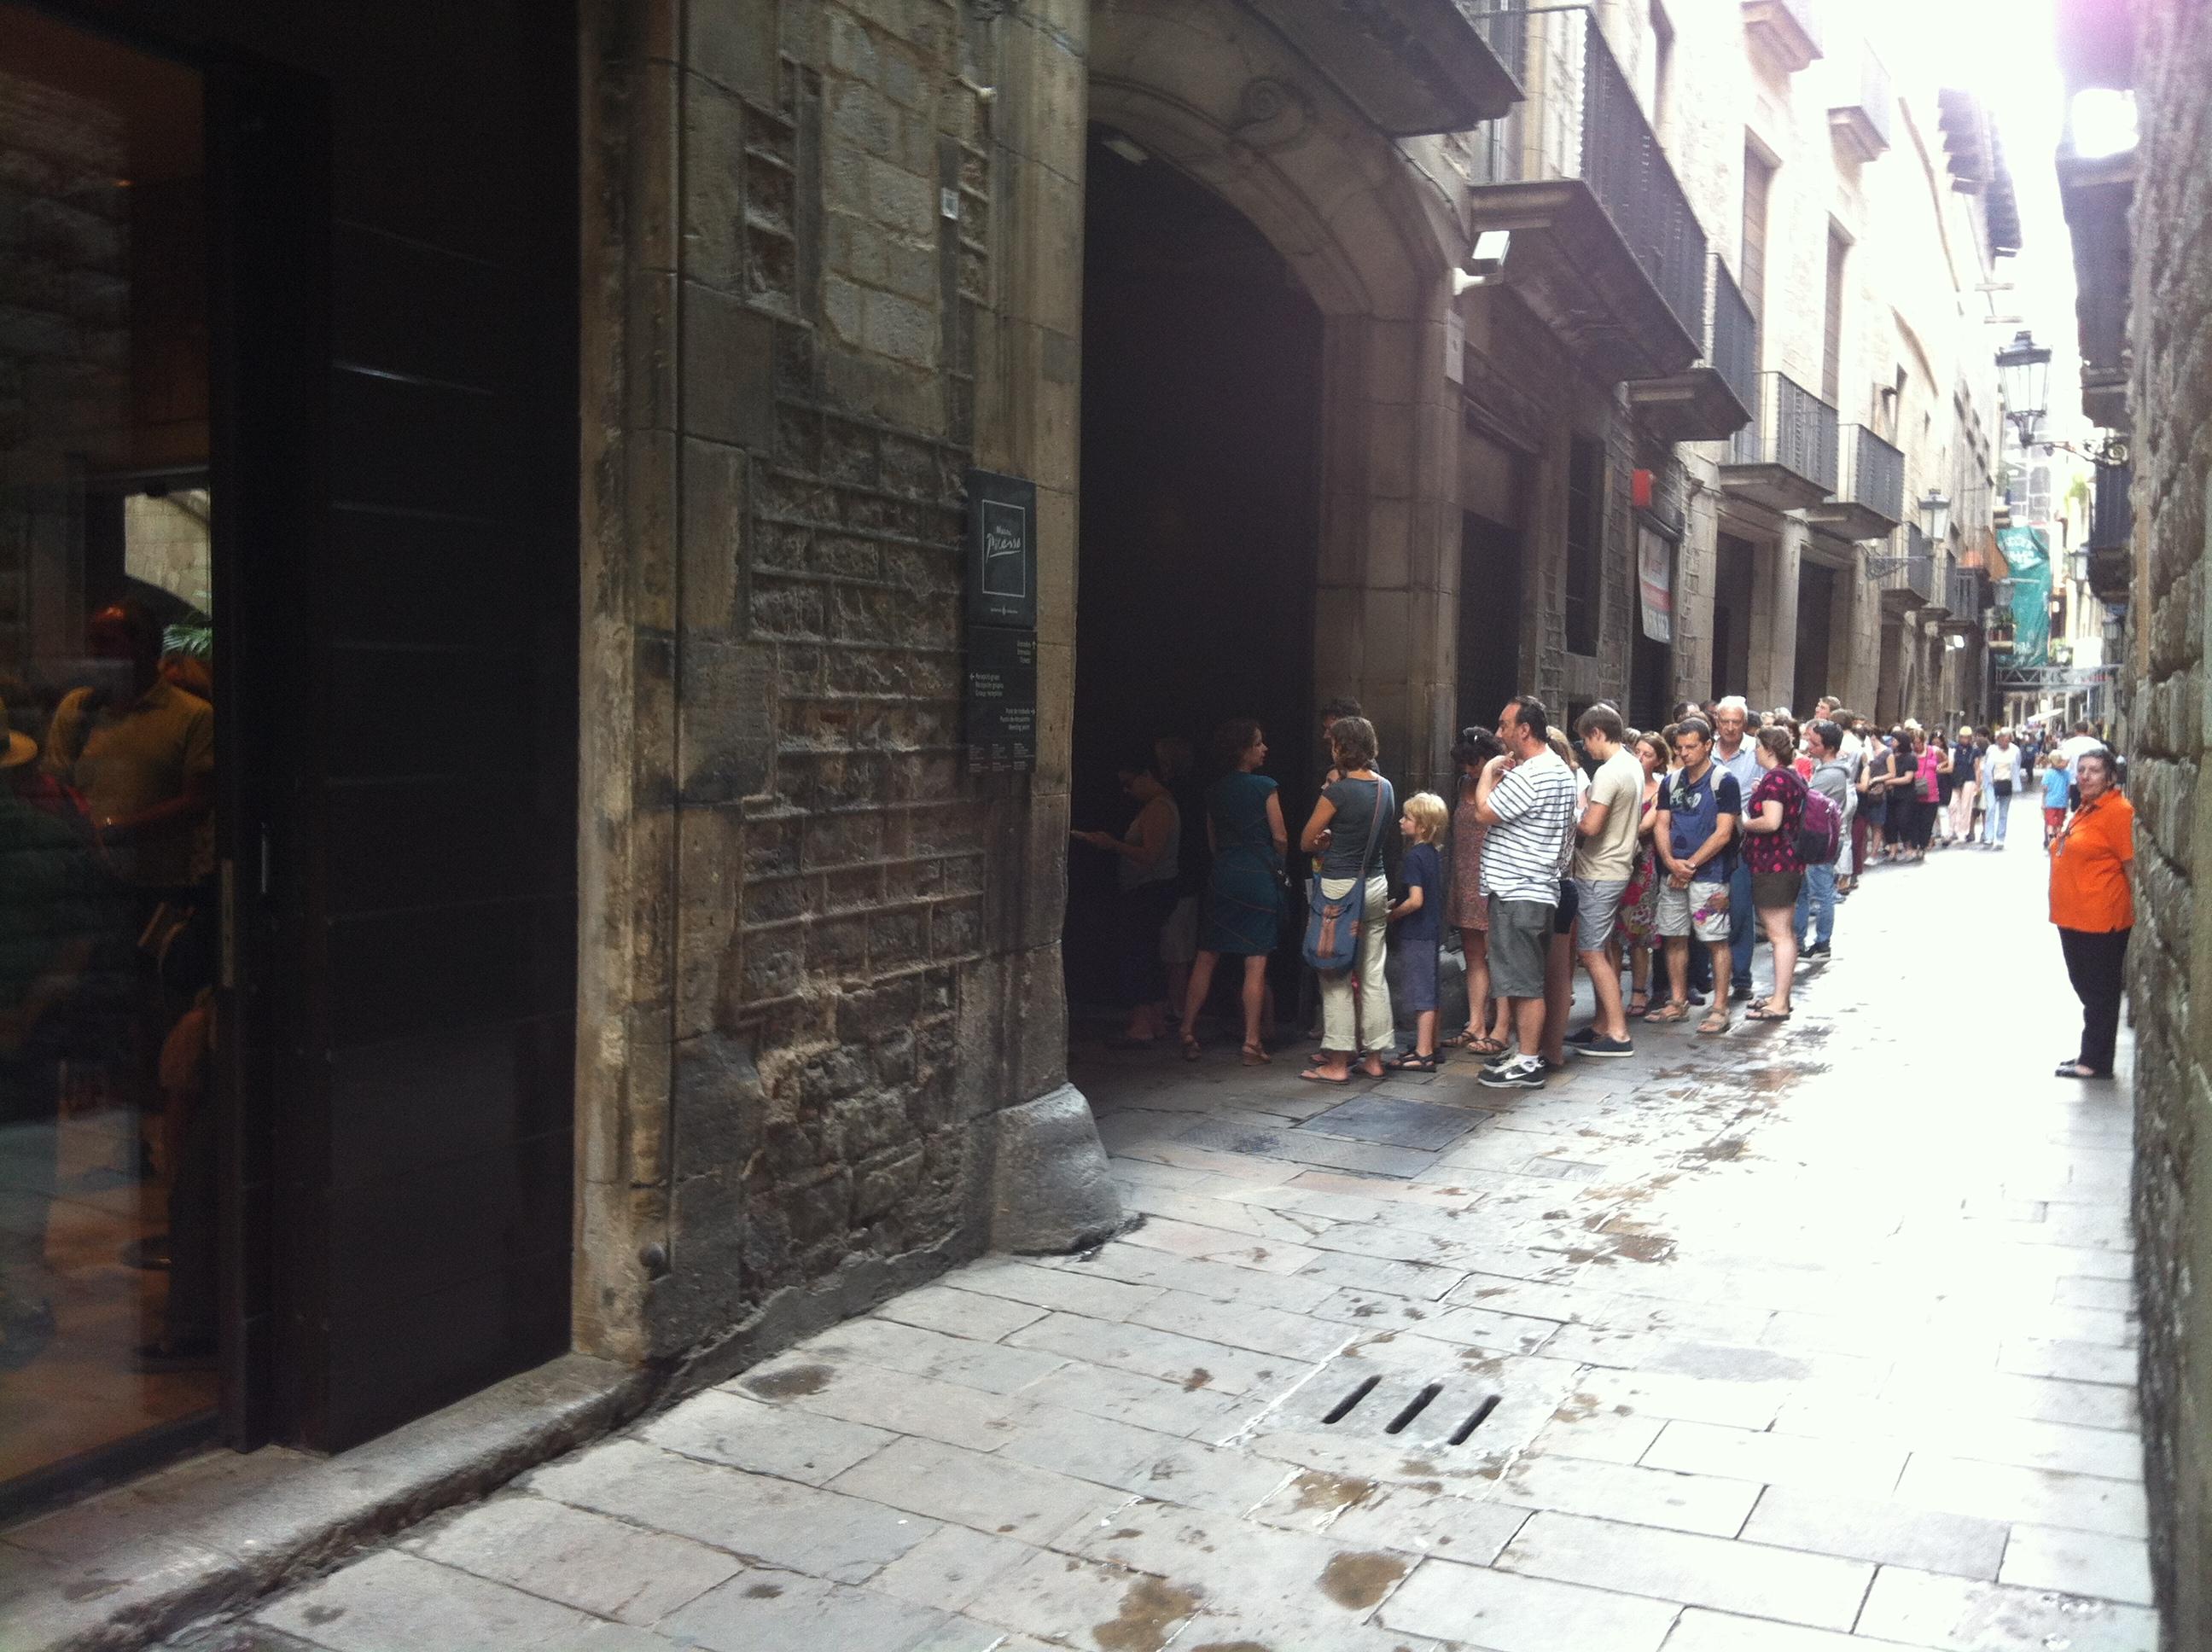 File:Museu Picasso Barcelona- queues (2).jpg